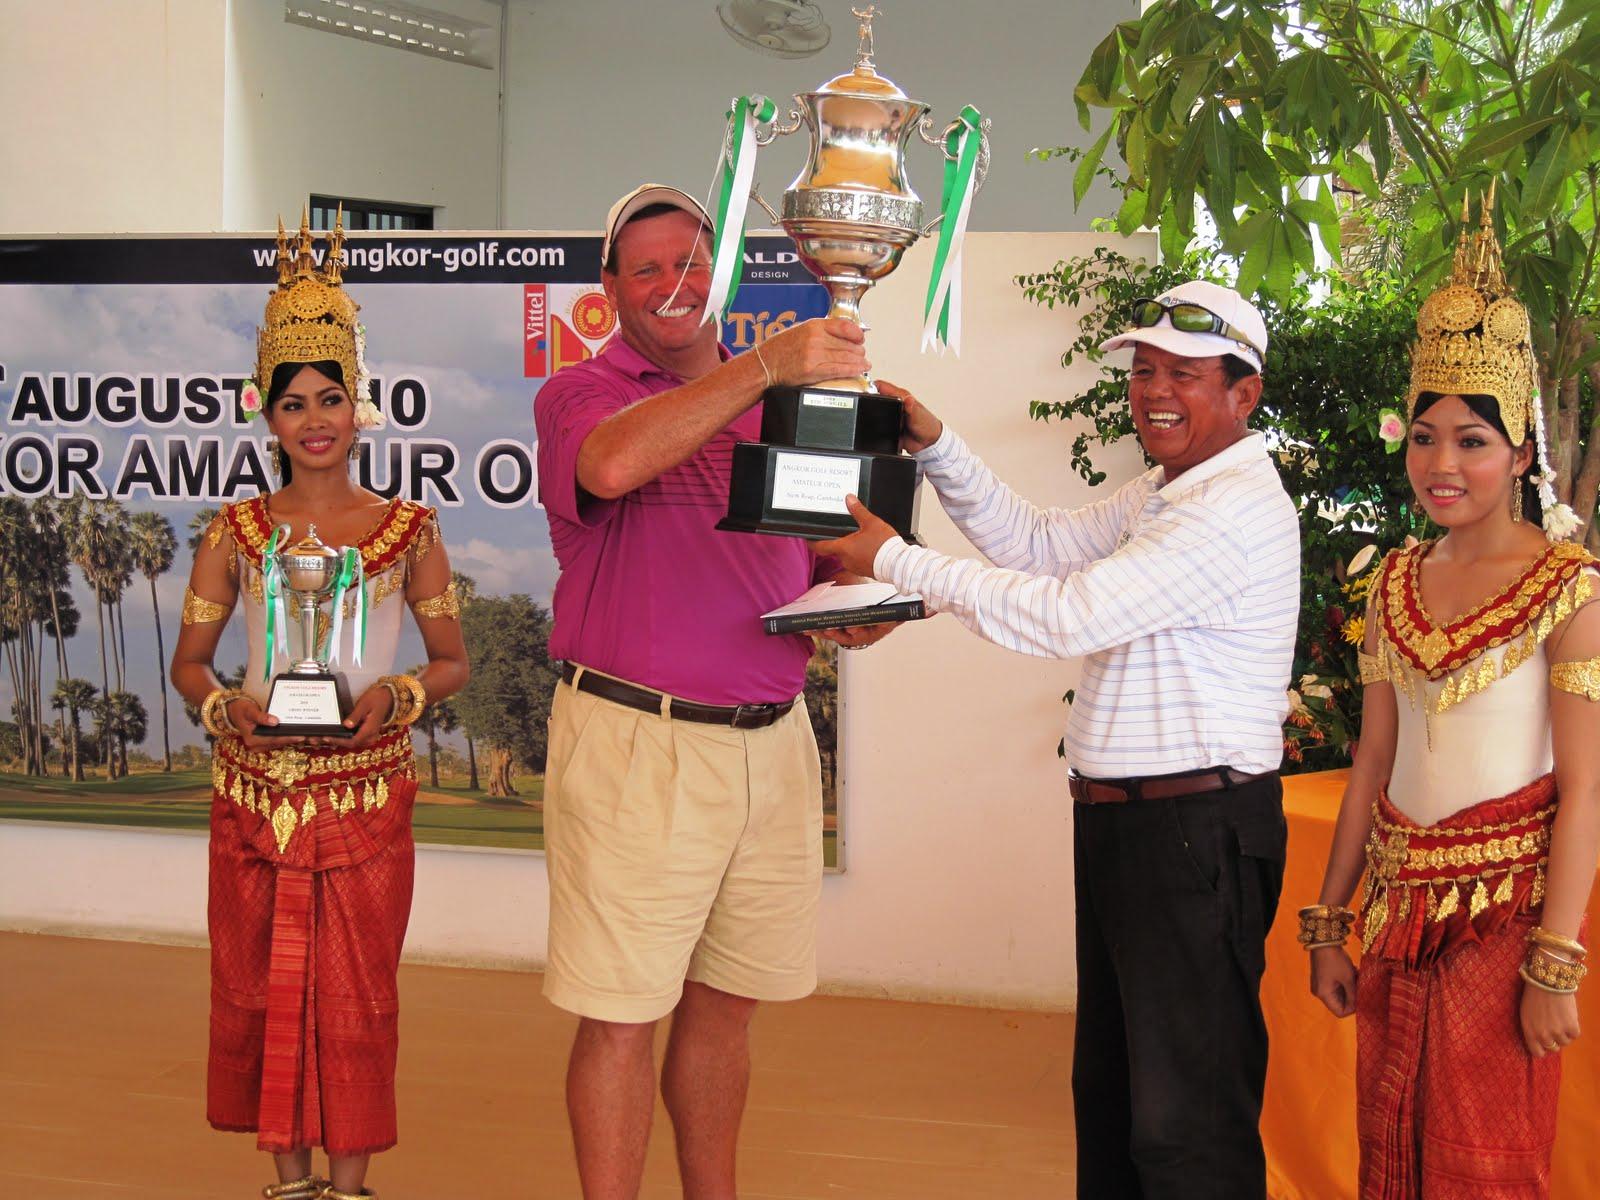 Winner of the Angkor Amateur Open 2010; Scott Puzey receiving trophy from HE Souphirin